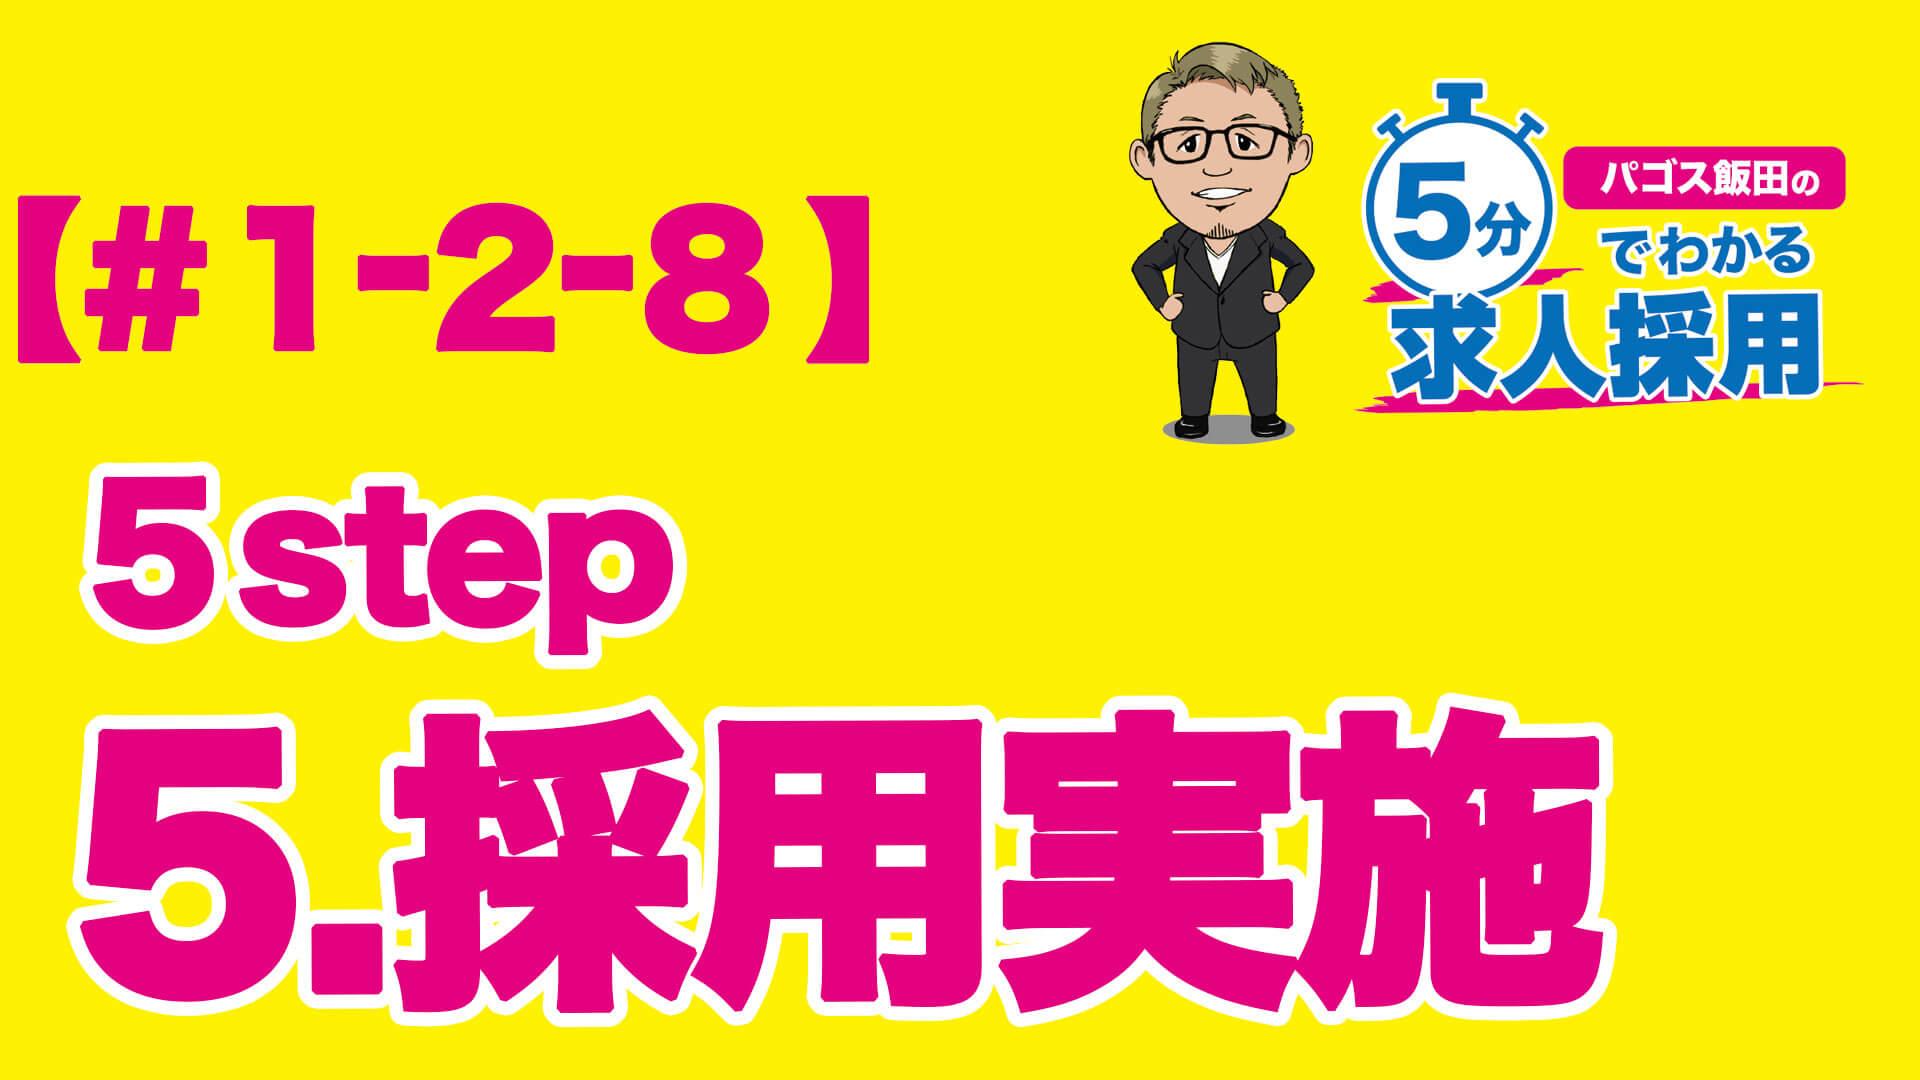 【#1-2-8】5step 5.採用実施